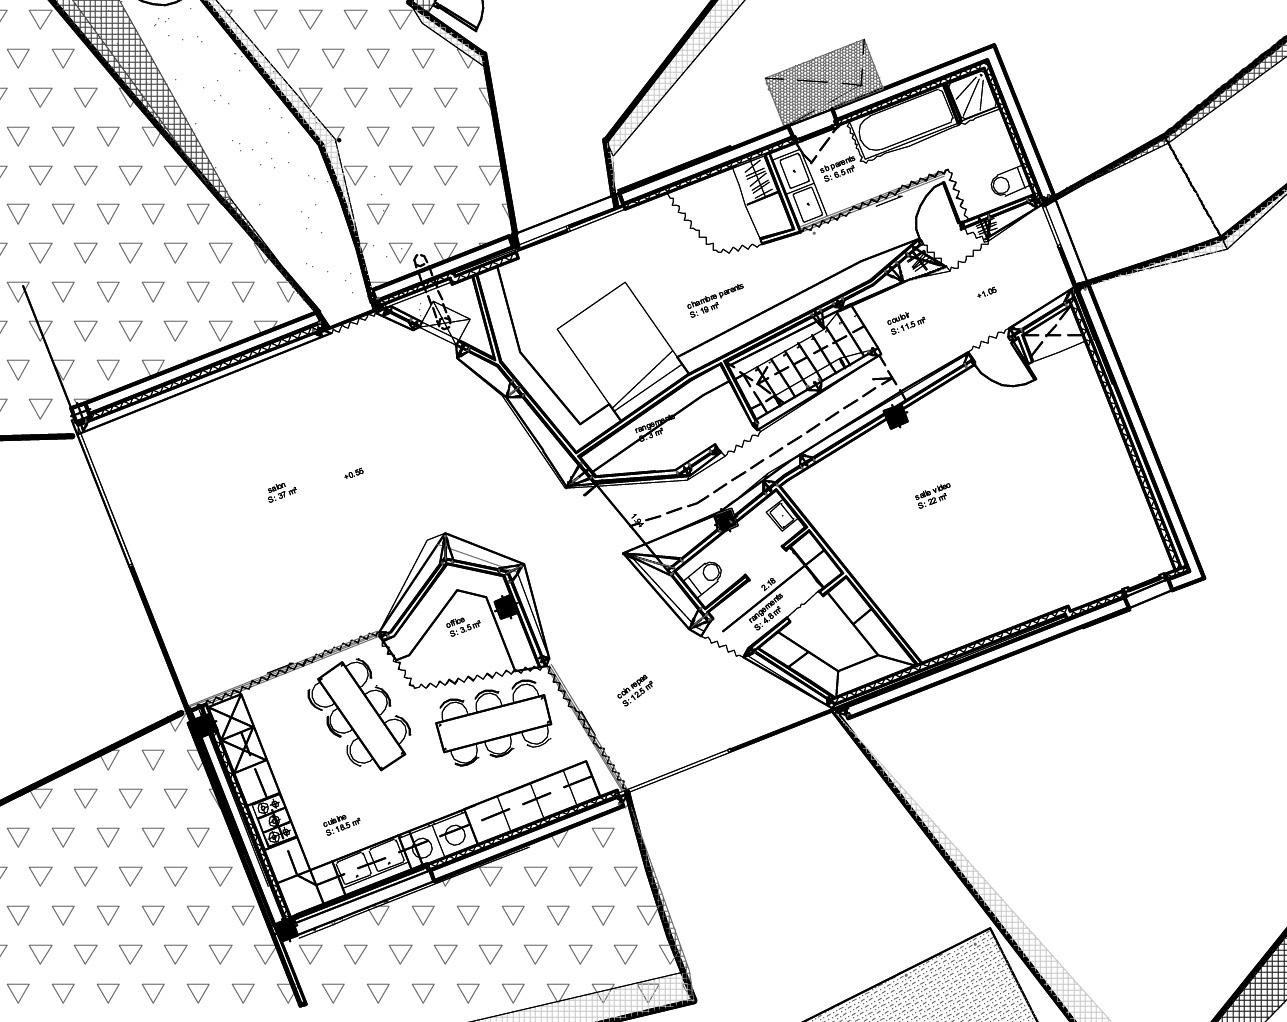 2146499565 spider hewood3 interior first floor plan